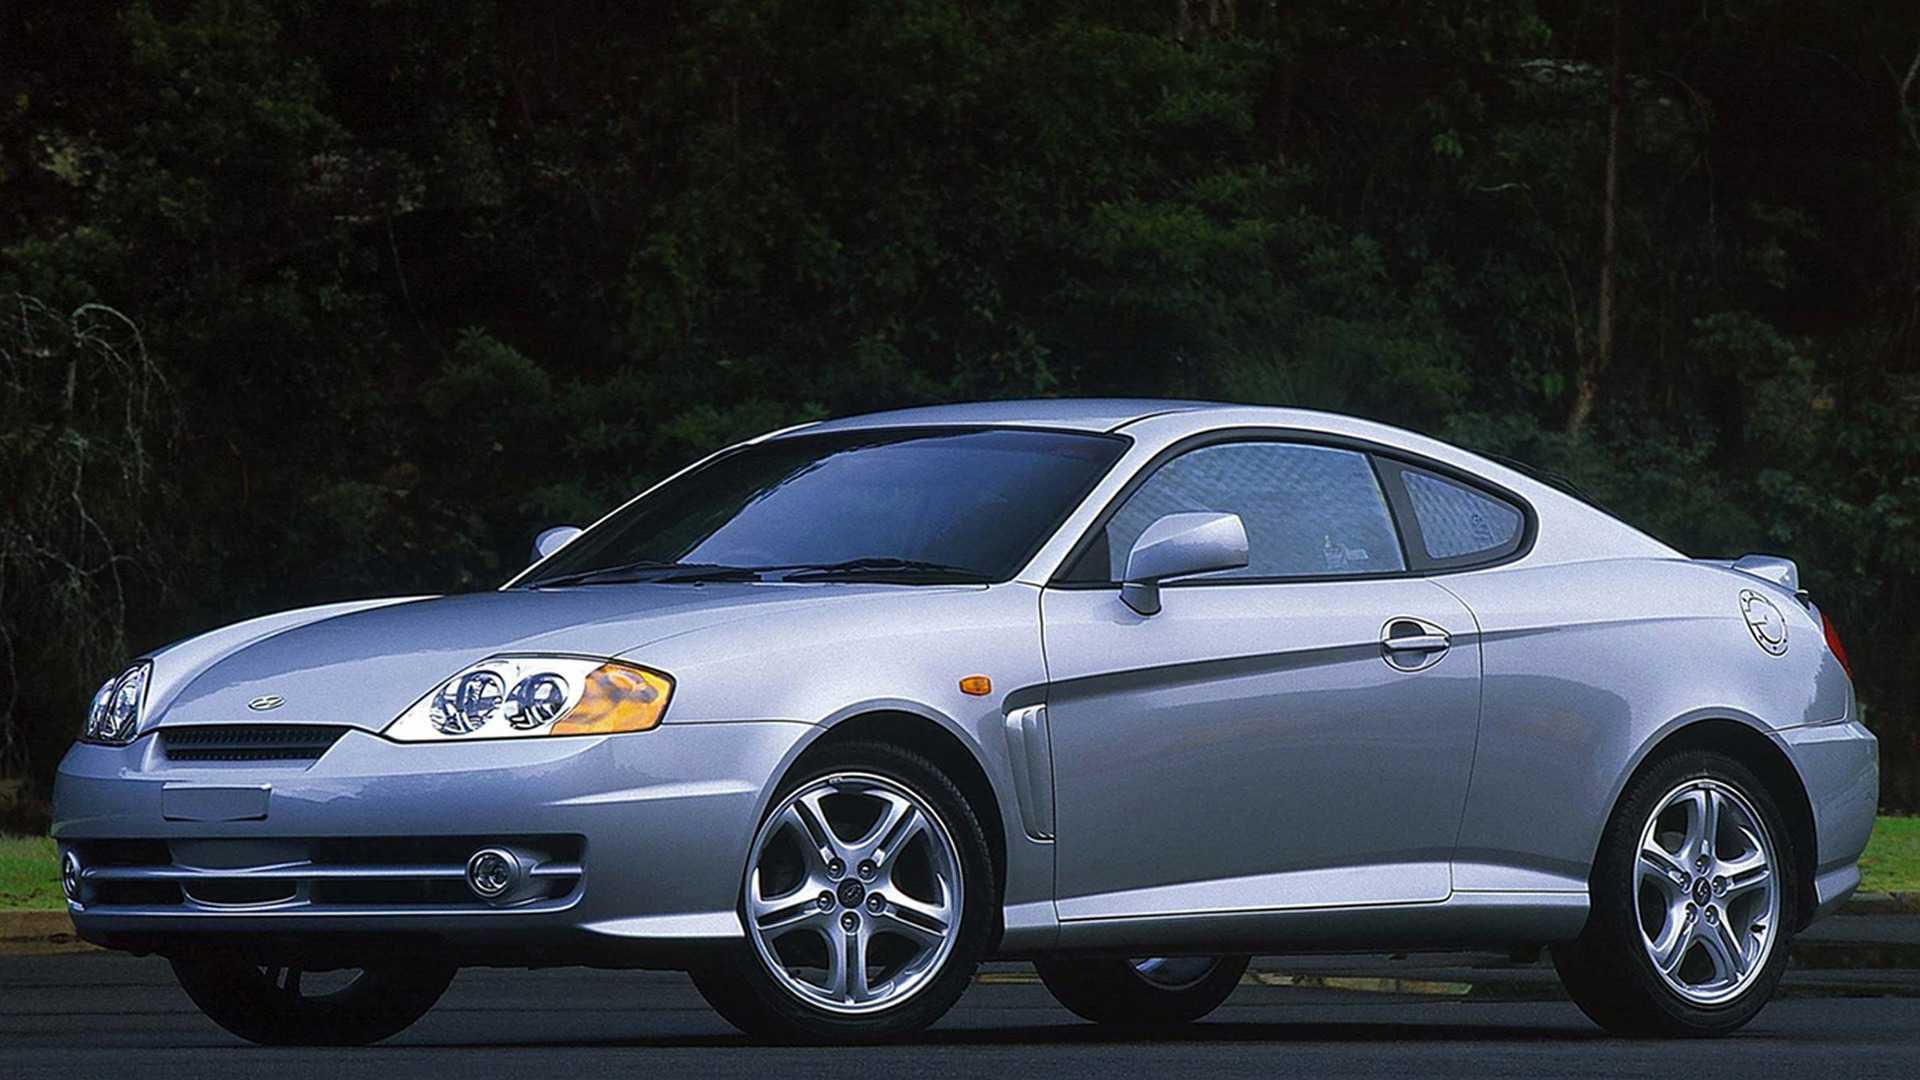 Worst Sports Cars Hyundai Tiburon